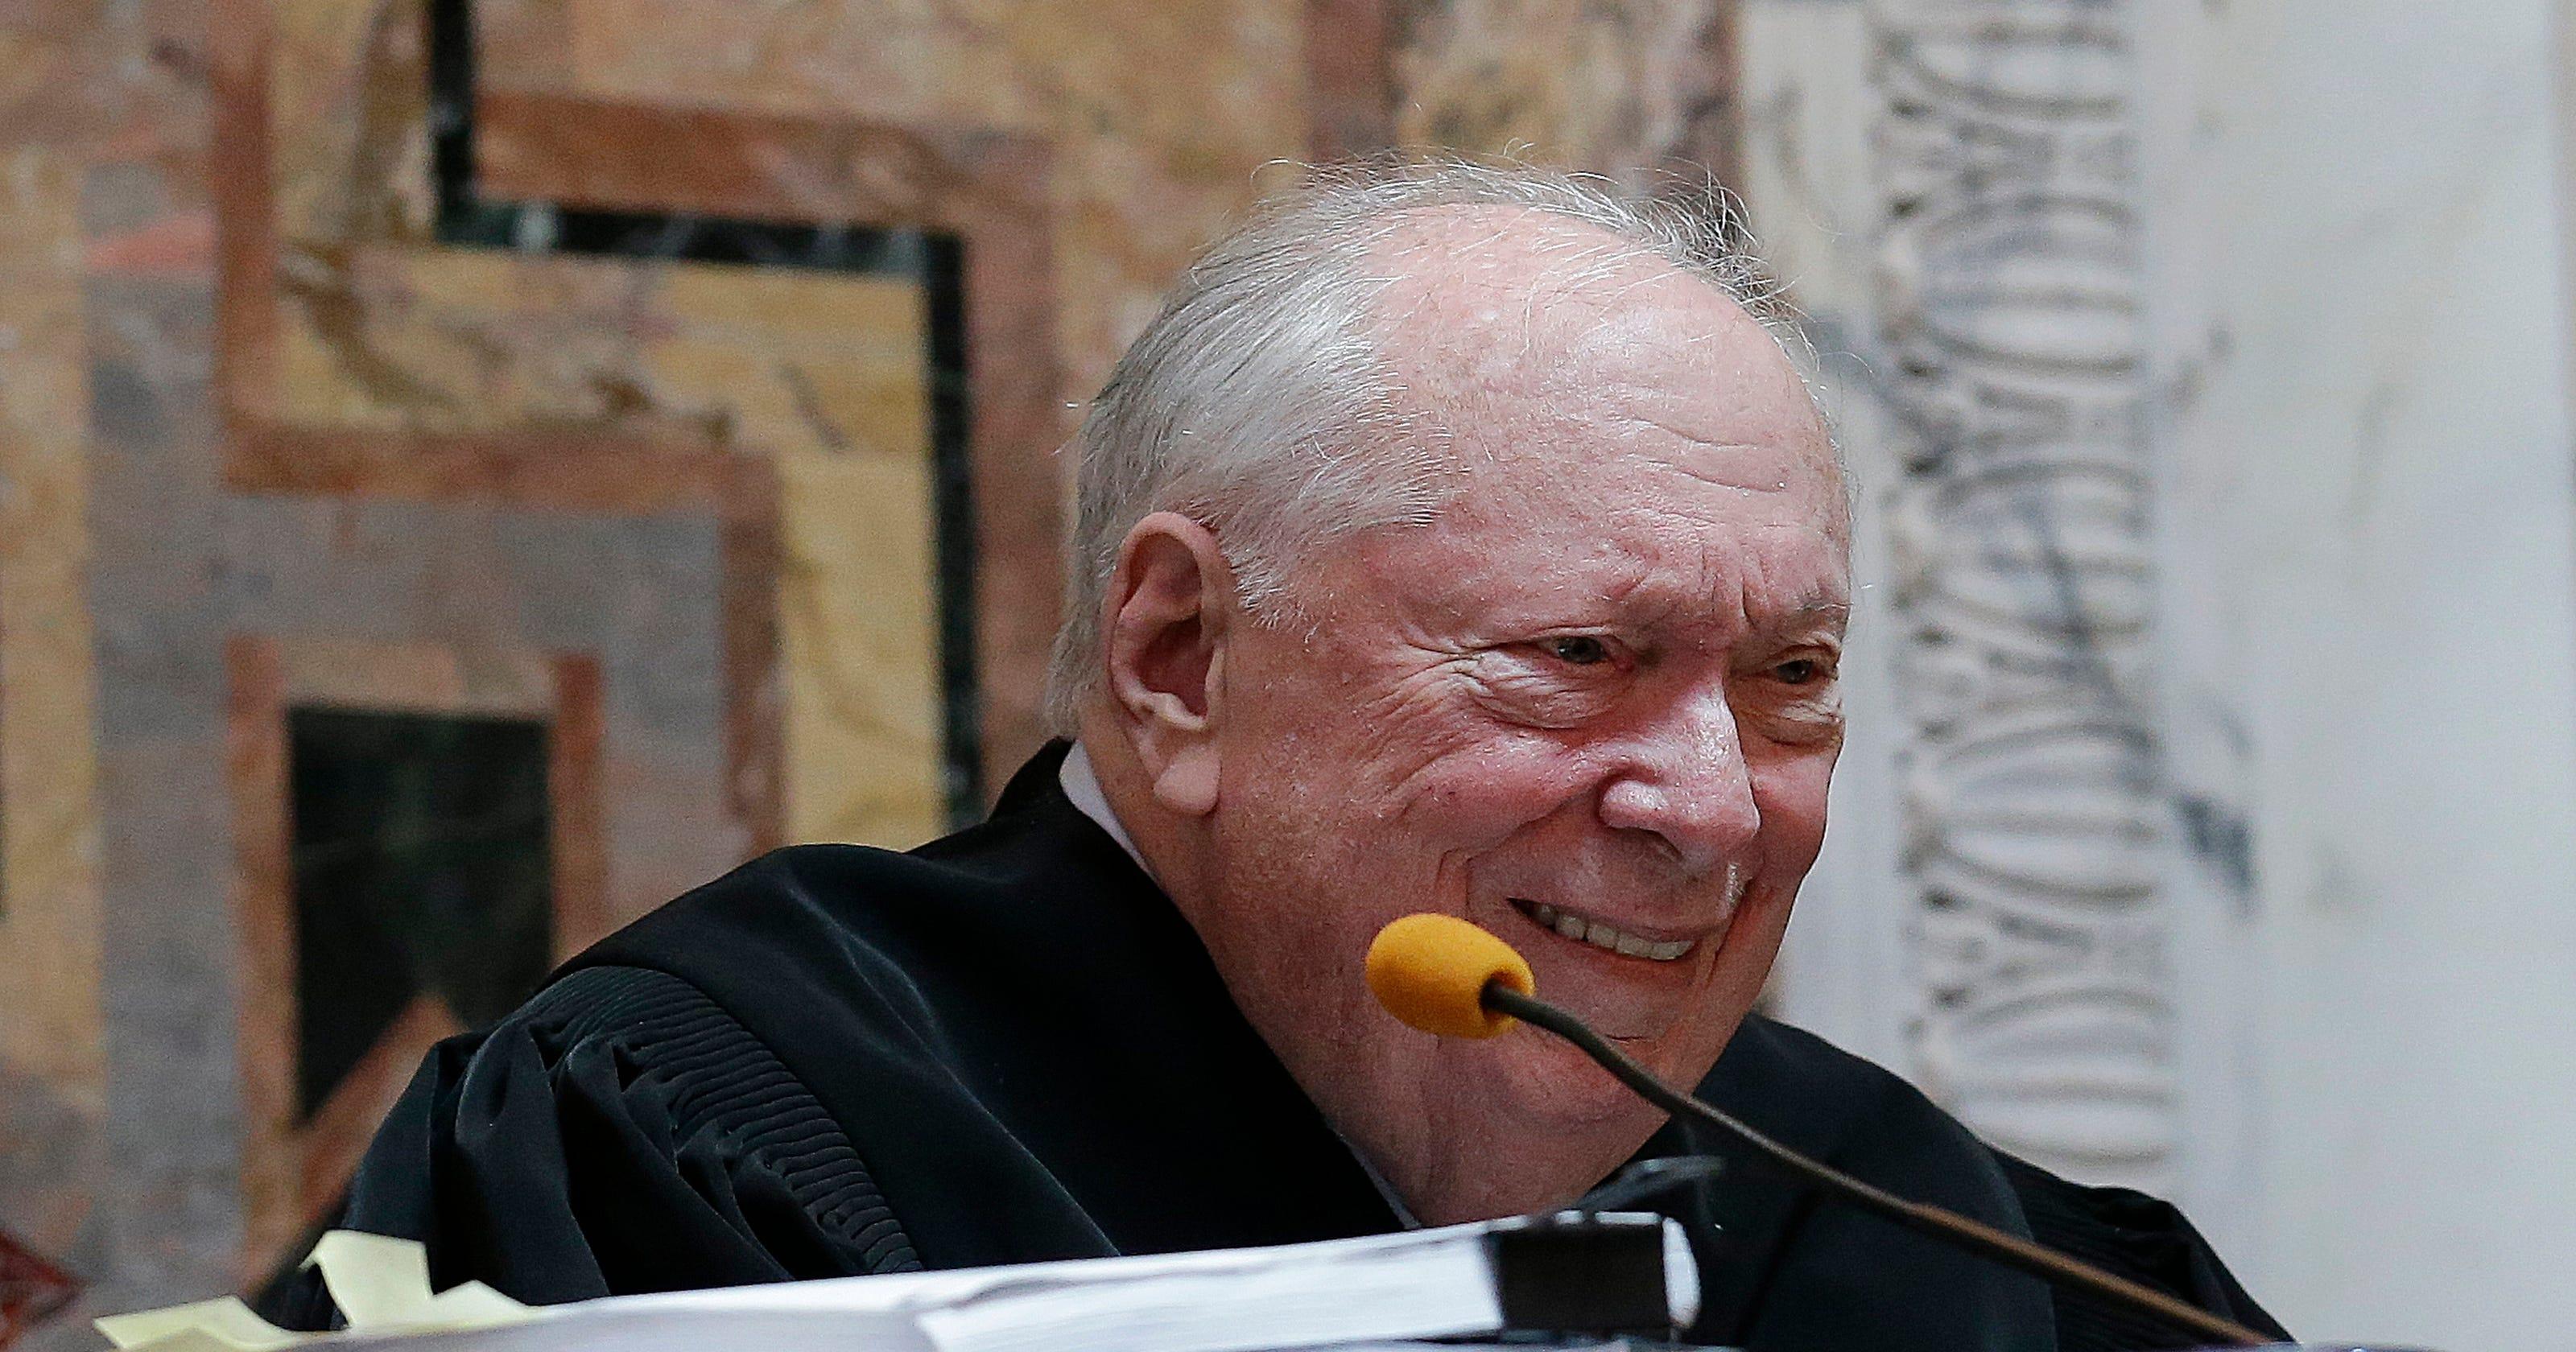 Liberal US judge who struck down 'under God' in pledge dies